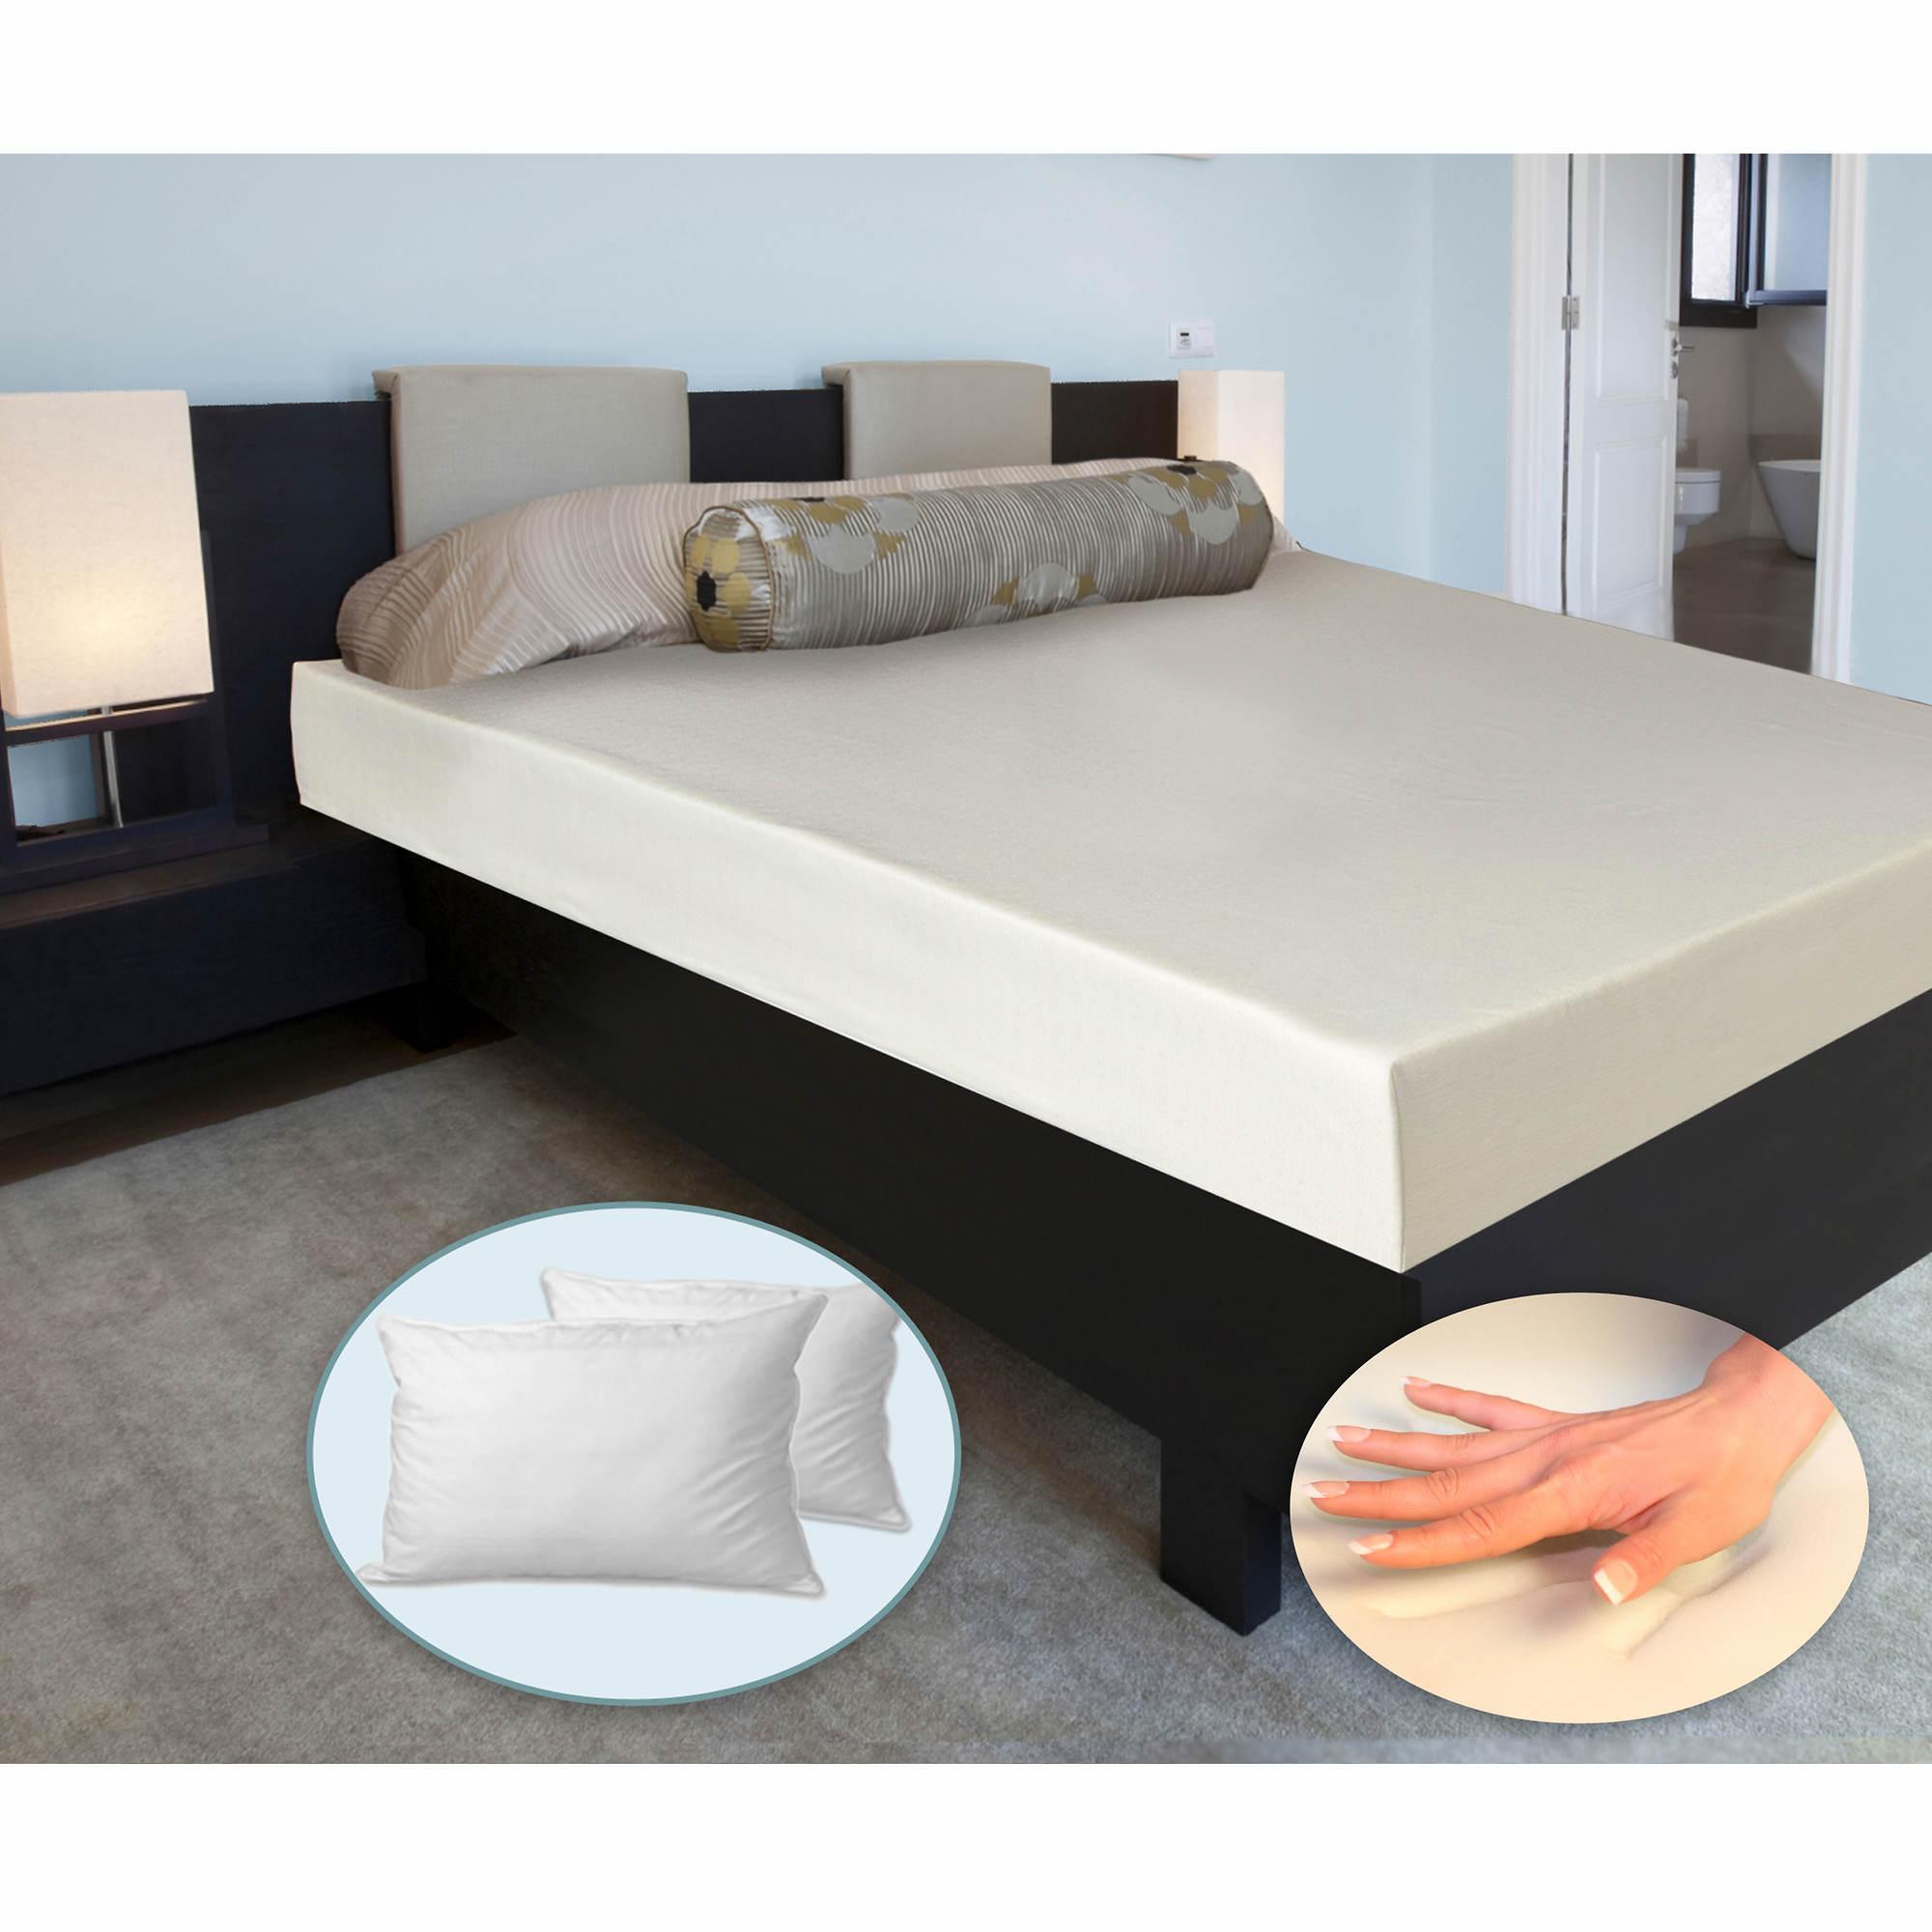 cradlesoft twin xl size 6 memory foam mattress with bonus fiberfill standard pillow bj 39 s. Black Bedroom Furniture Sets. Home Design Ideas